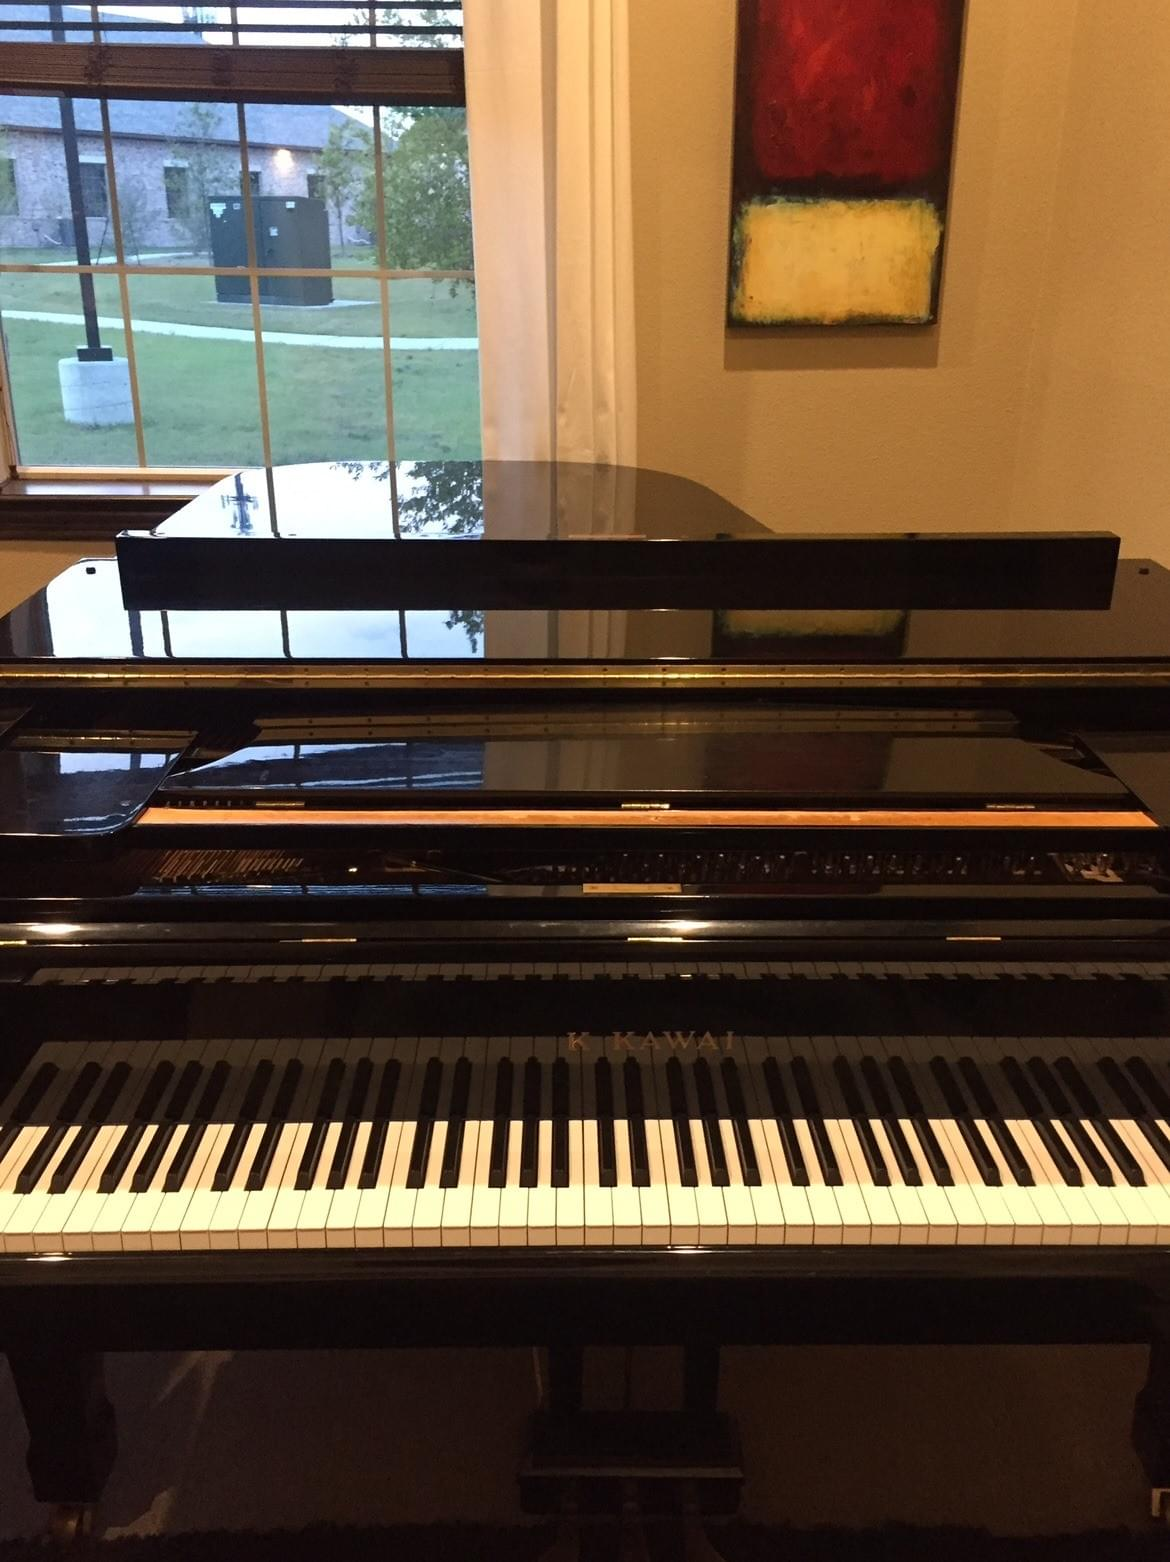 New to Me Pianos | Premium Used Piano in Frisco